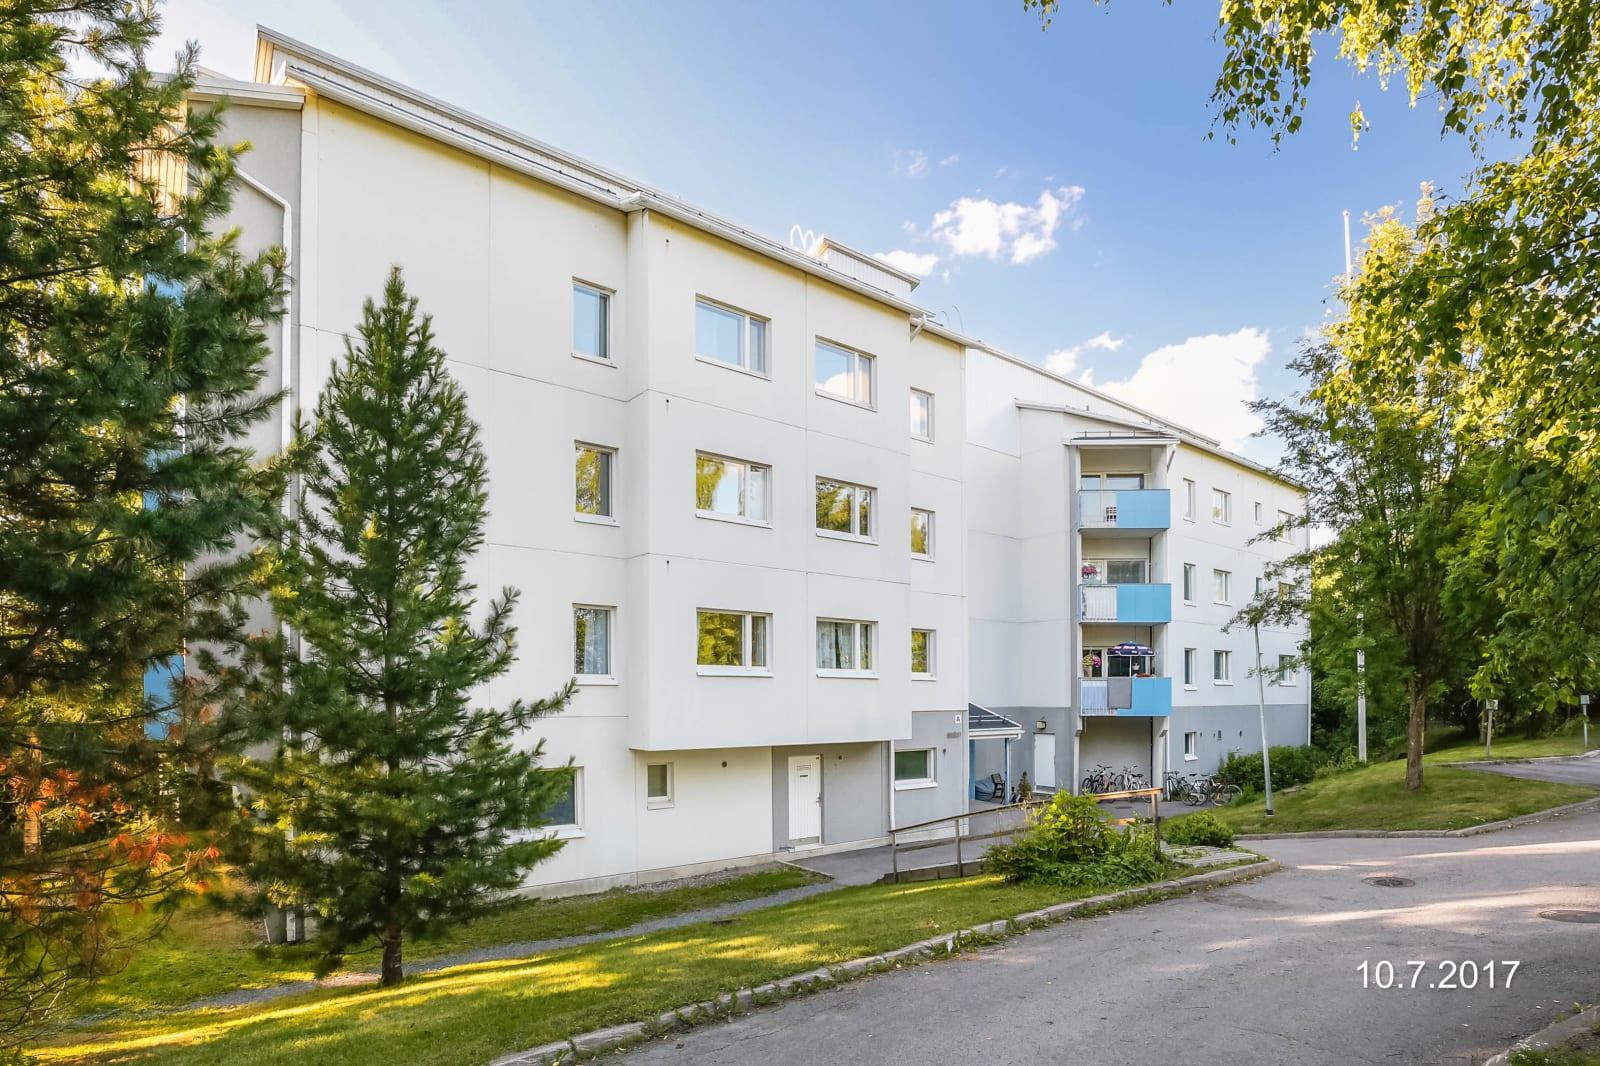 Tampere, Annala, Hikivuorenkatu 27